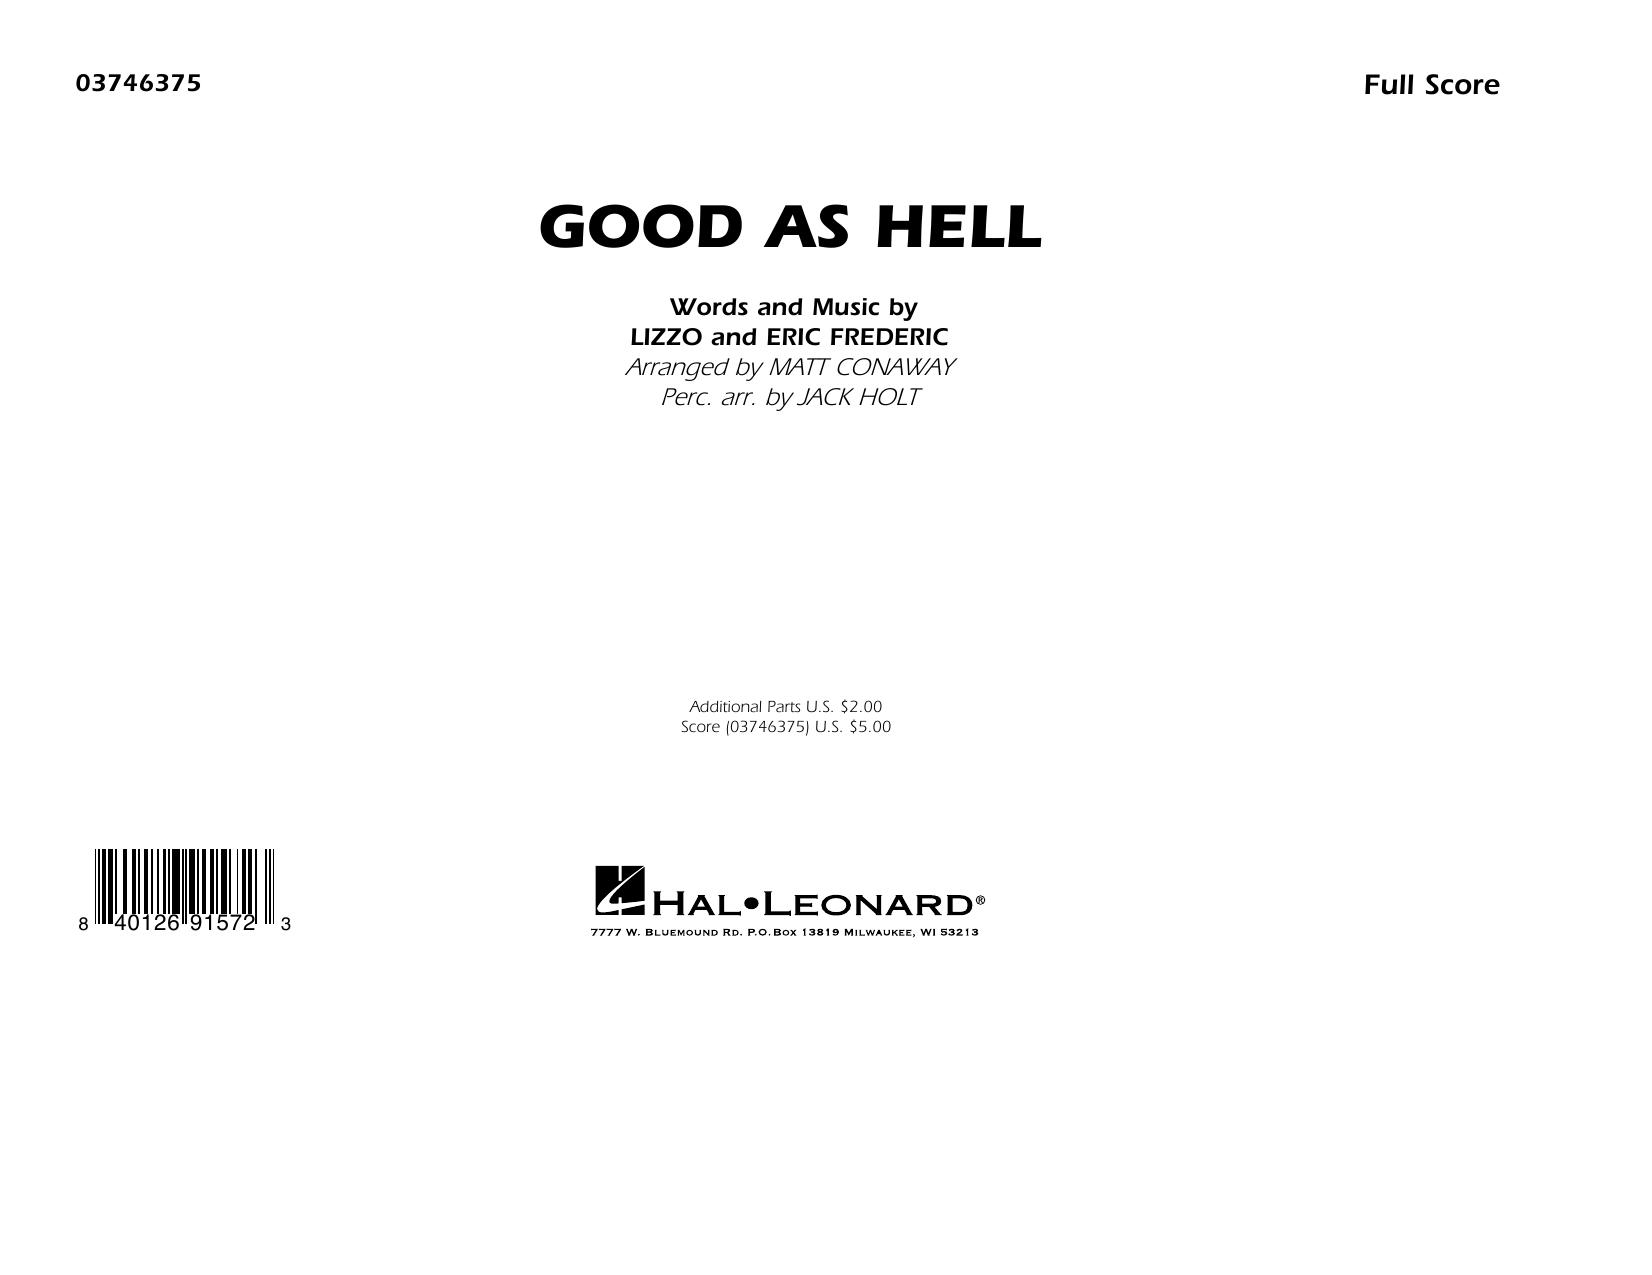 Good As Hell (arr. Matt Conaway and Jack Holt) - Conductor Score (Full Score) Sheet Music